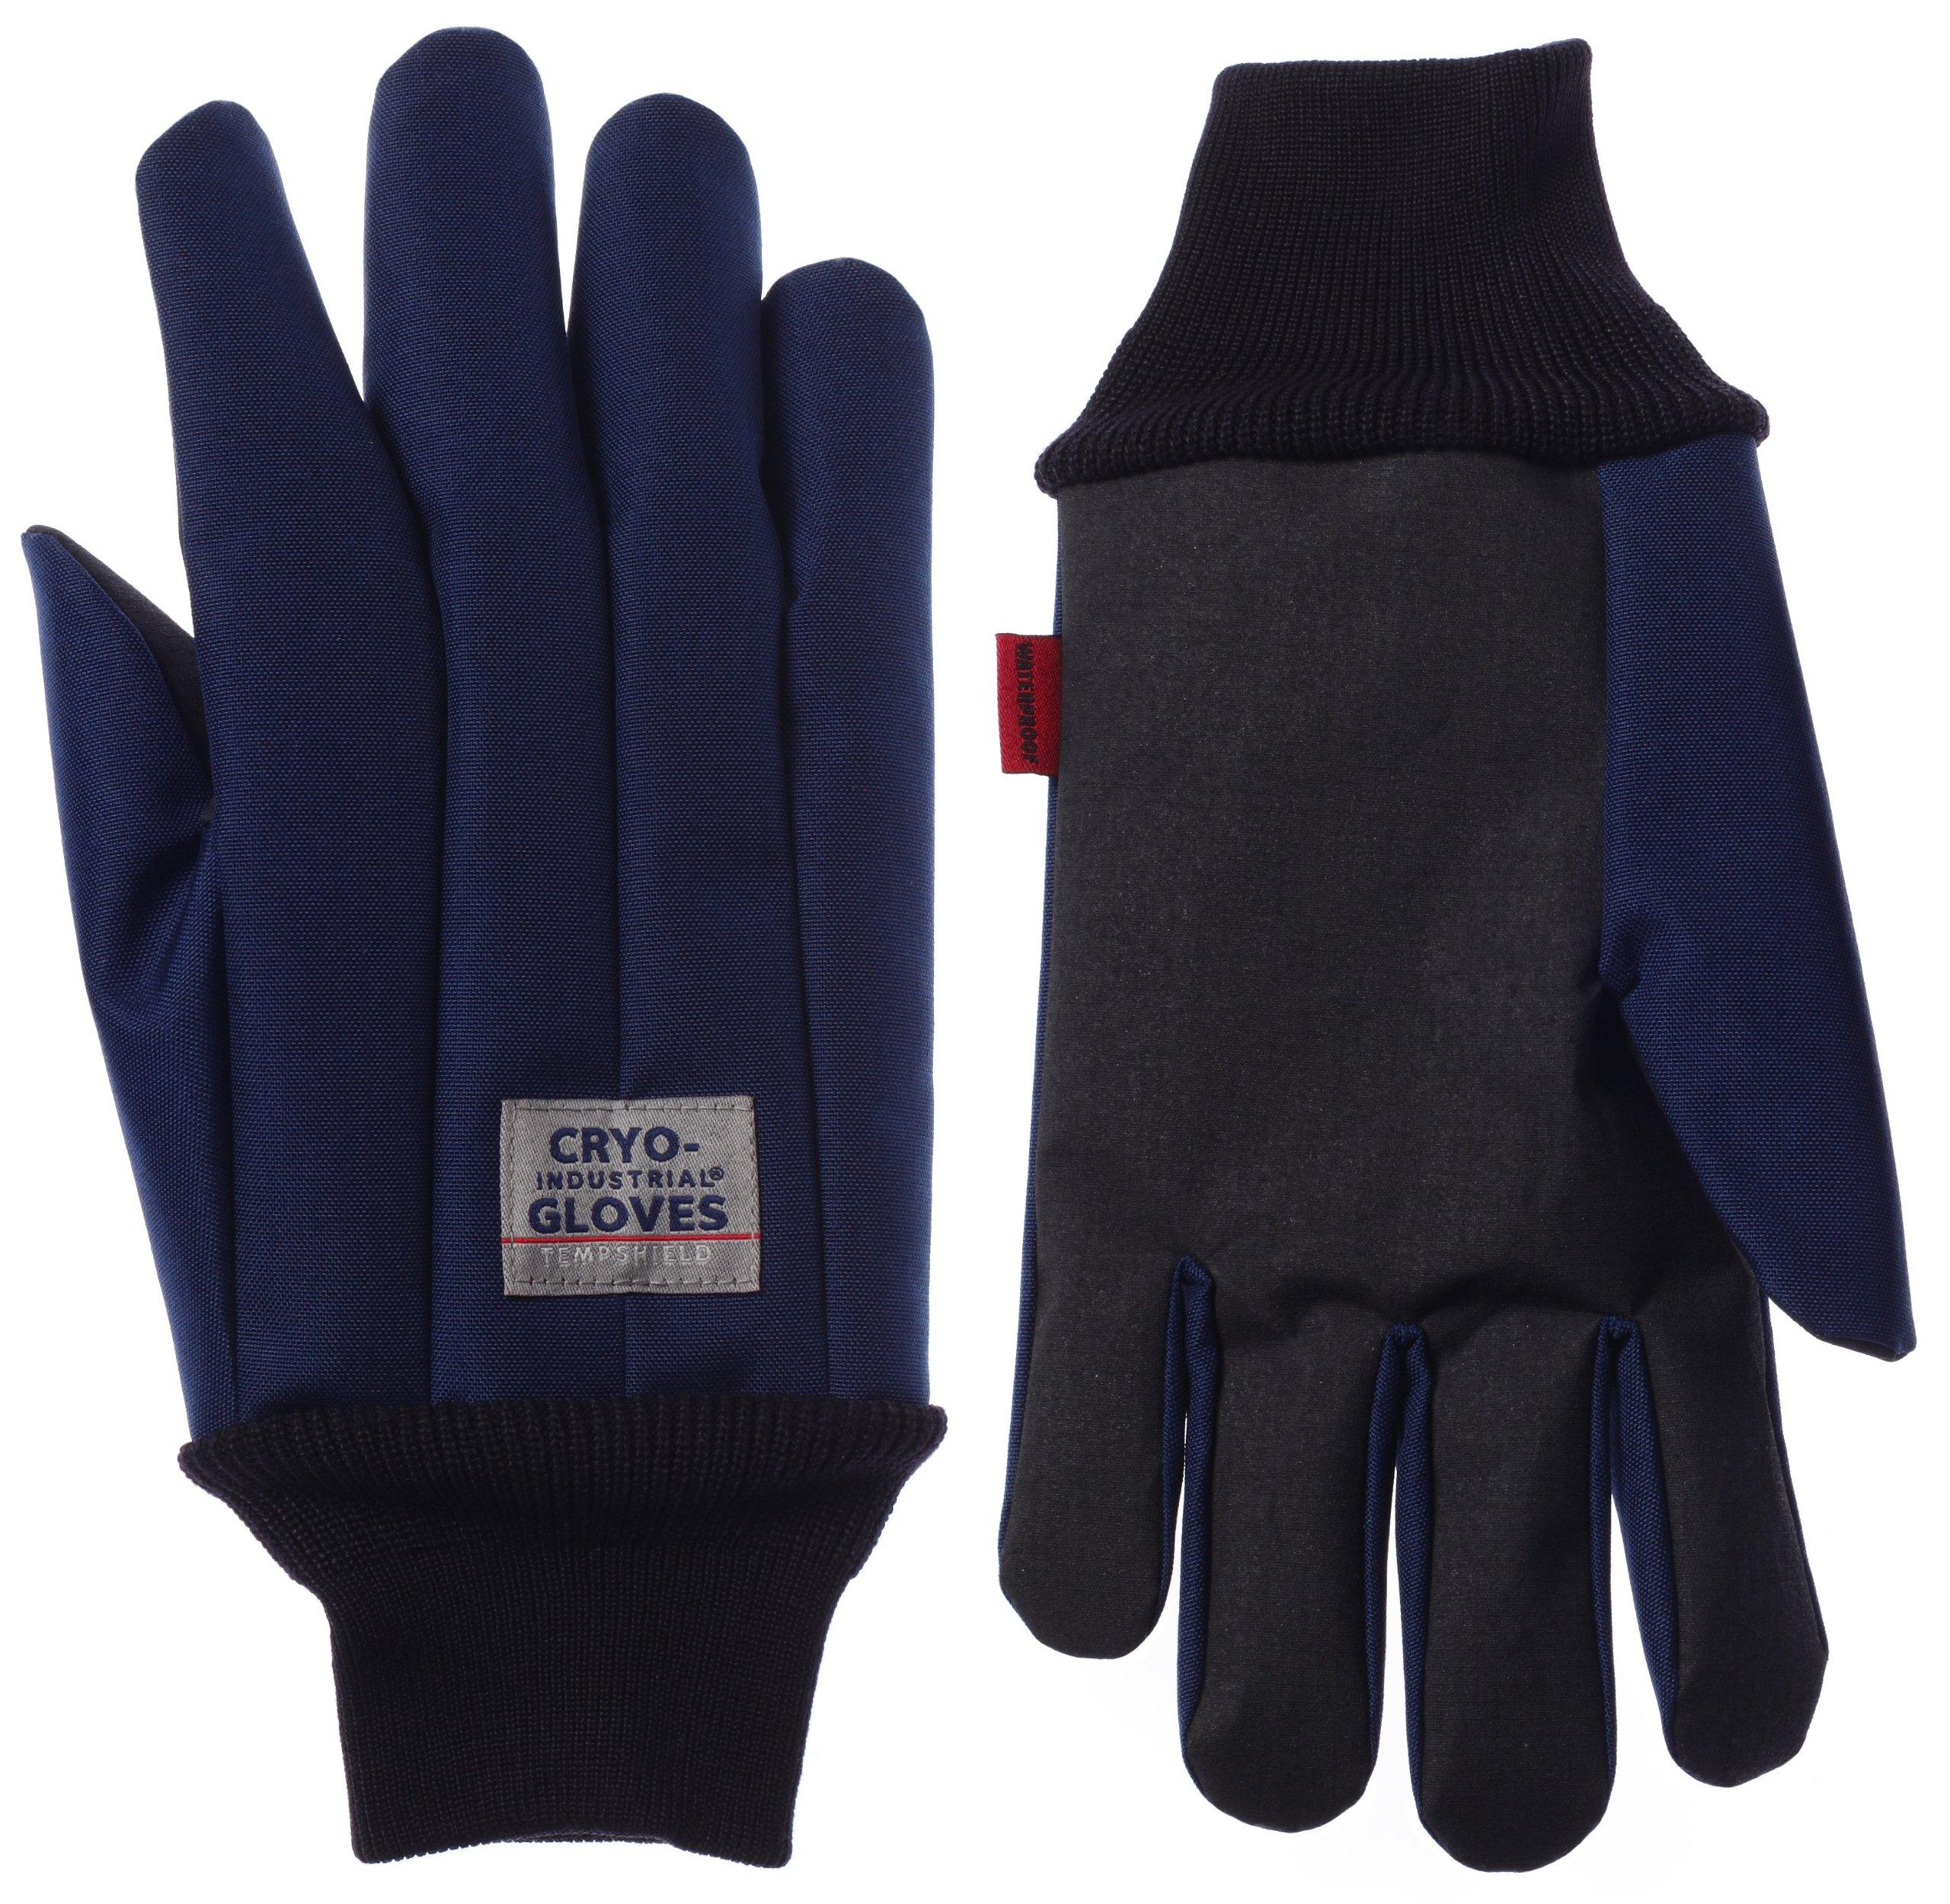 Tempshield TEMCG Cryo-Industrial Glove, Wrist Length, Cryogenic, XL (Pack of 1)